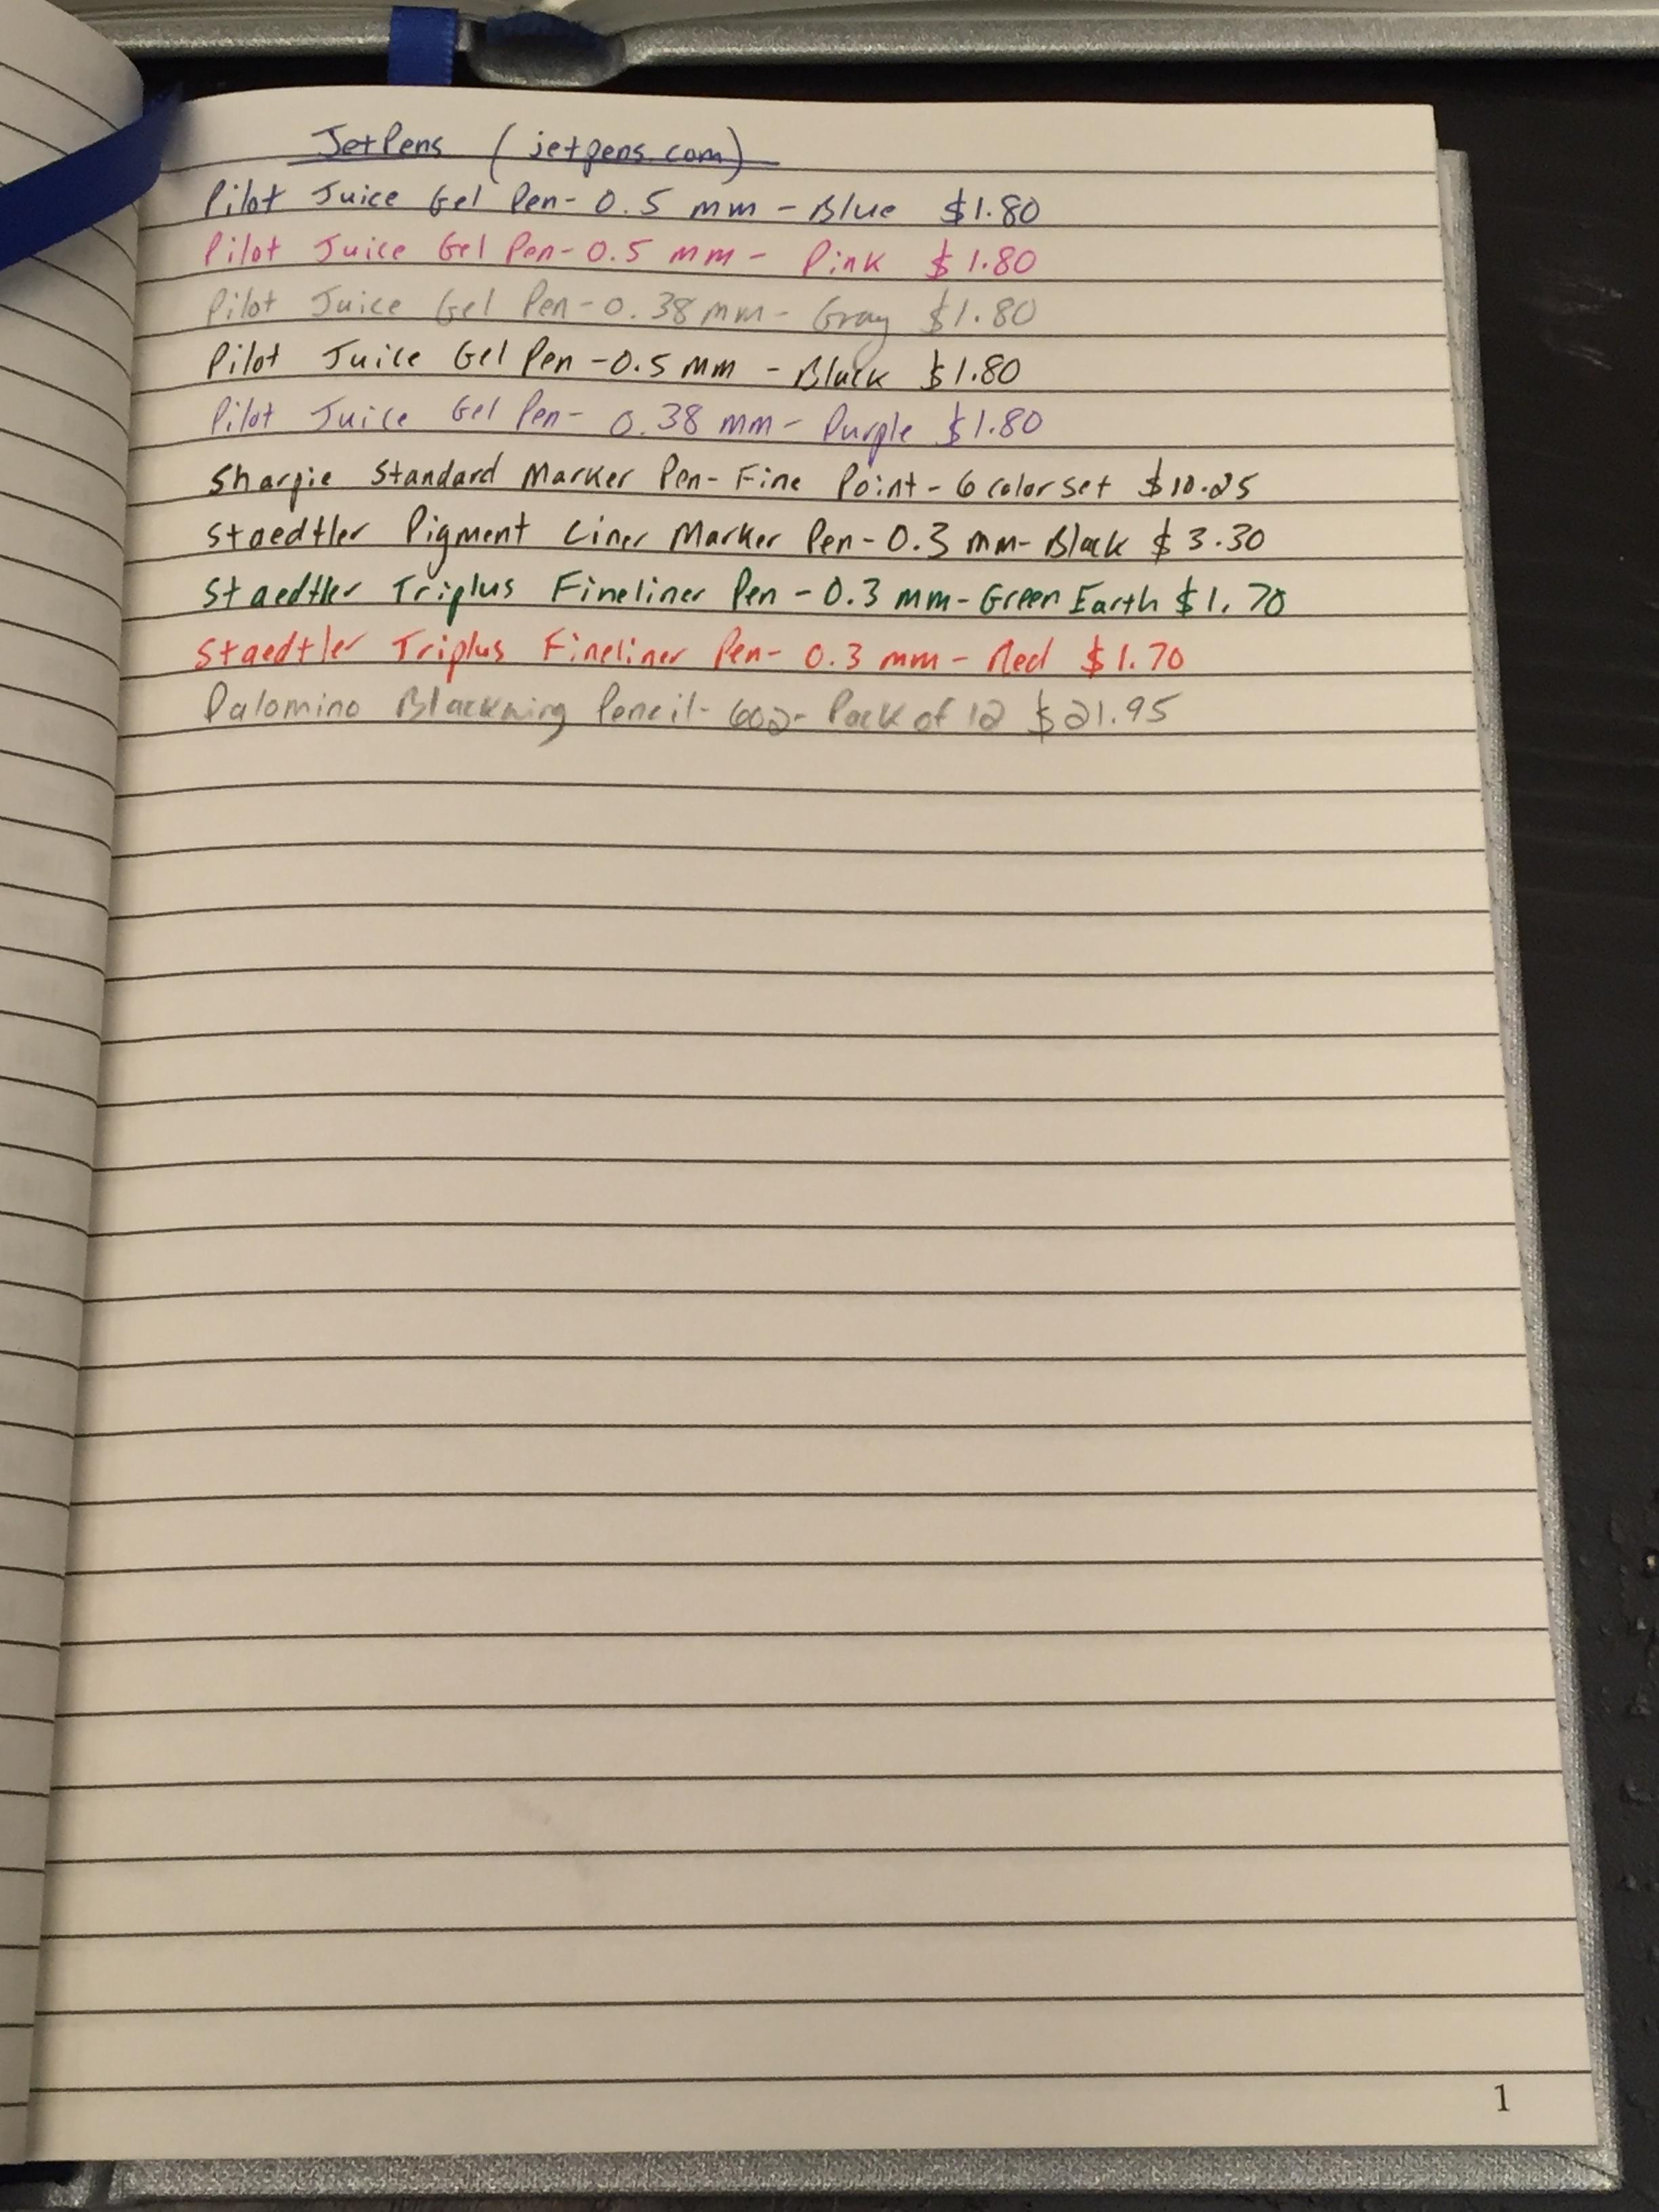 Buy List from  Jetpens . I love Pilot Juice gel ink pens; Palomino Blackwing 602 pencils; Sharpie fine point markers; and Staedtler triplus fineliners.